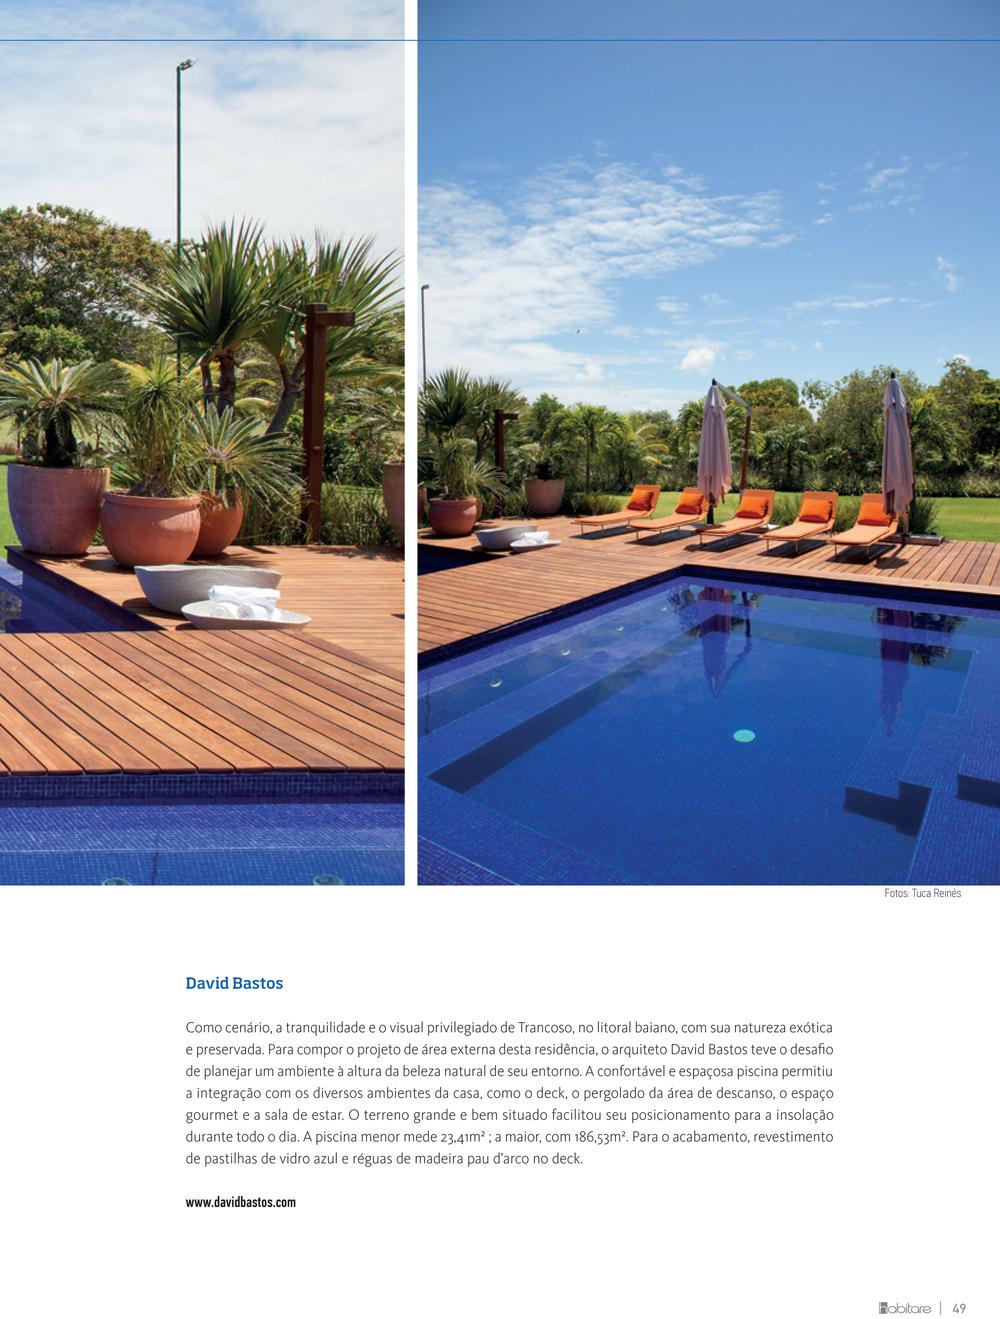 03 MARÇO ABRIL 2015_revista habitare ed 51 (2).jpg